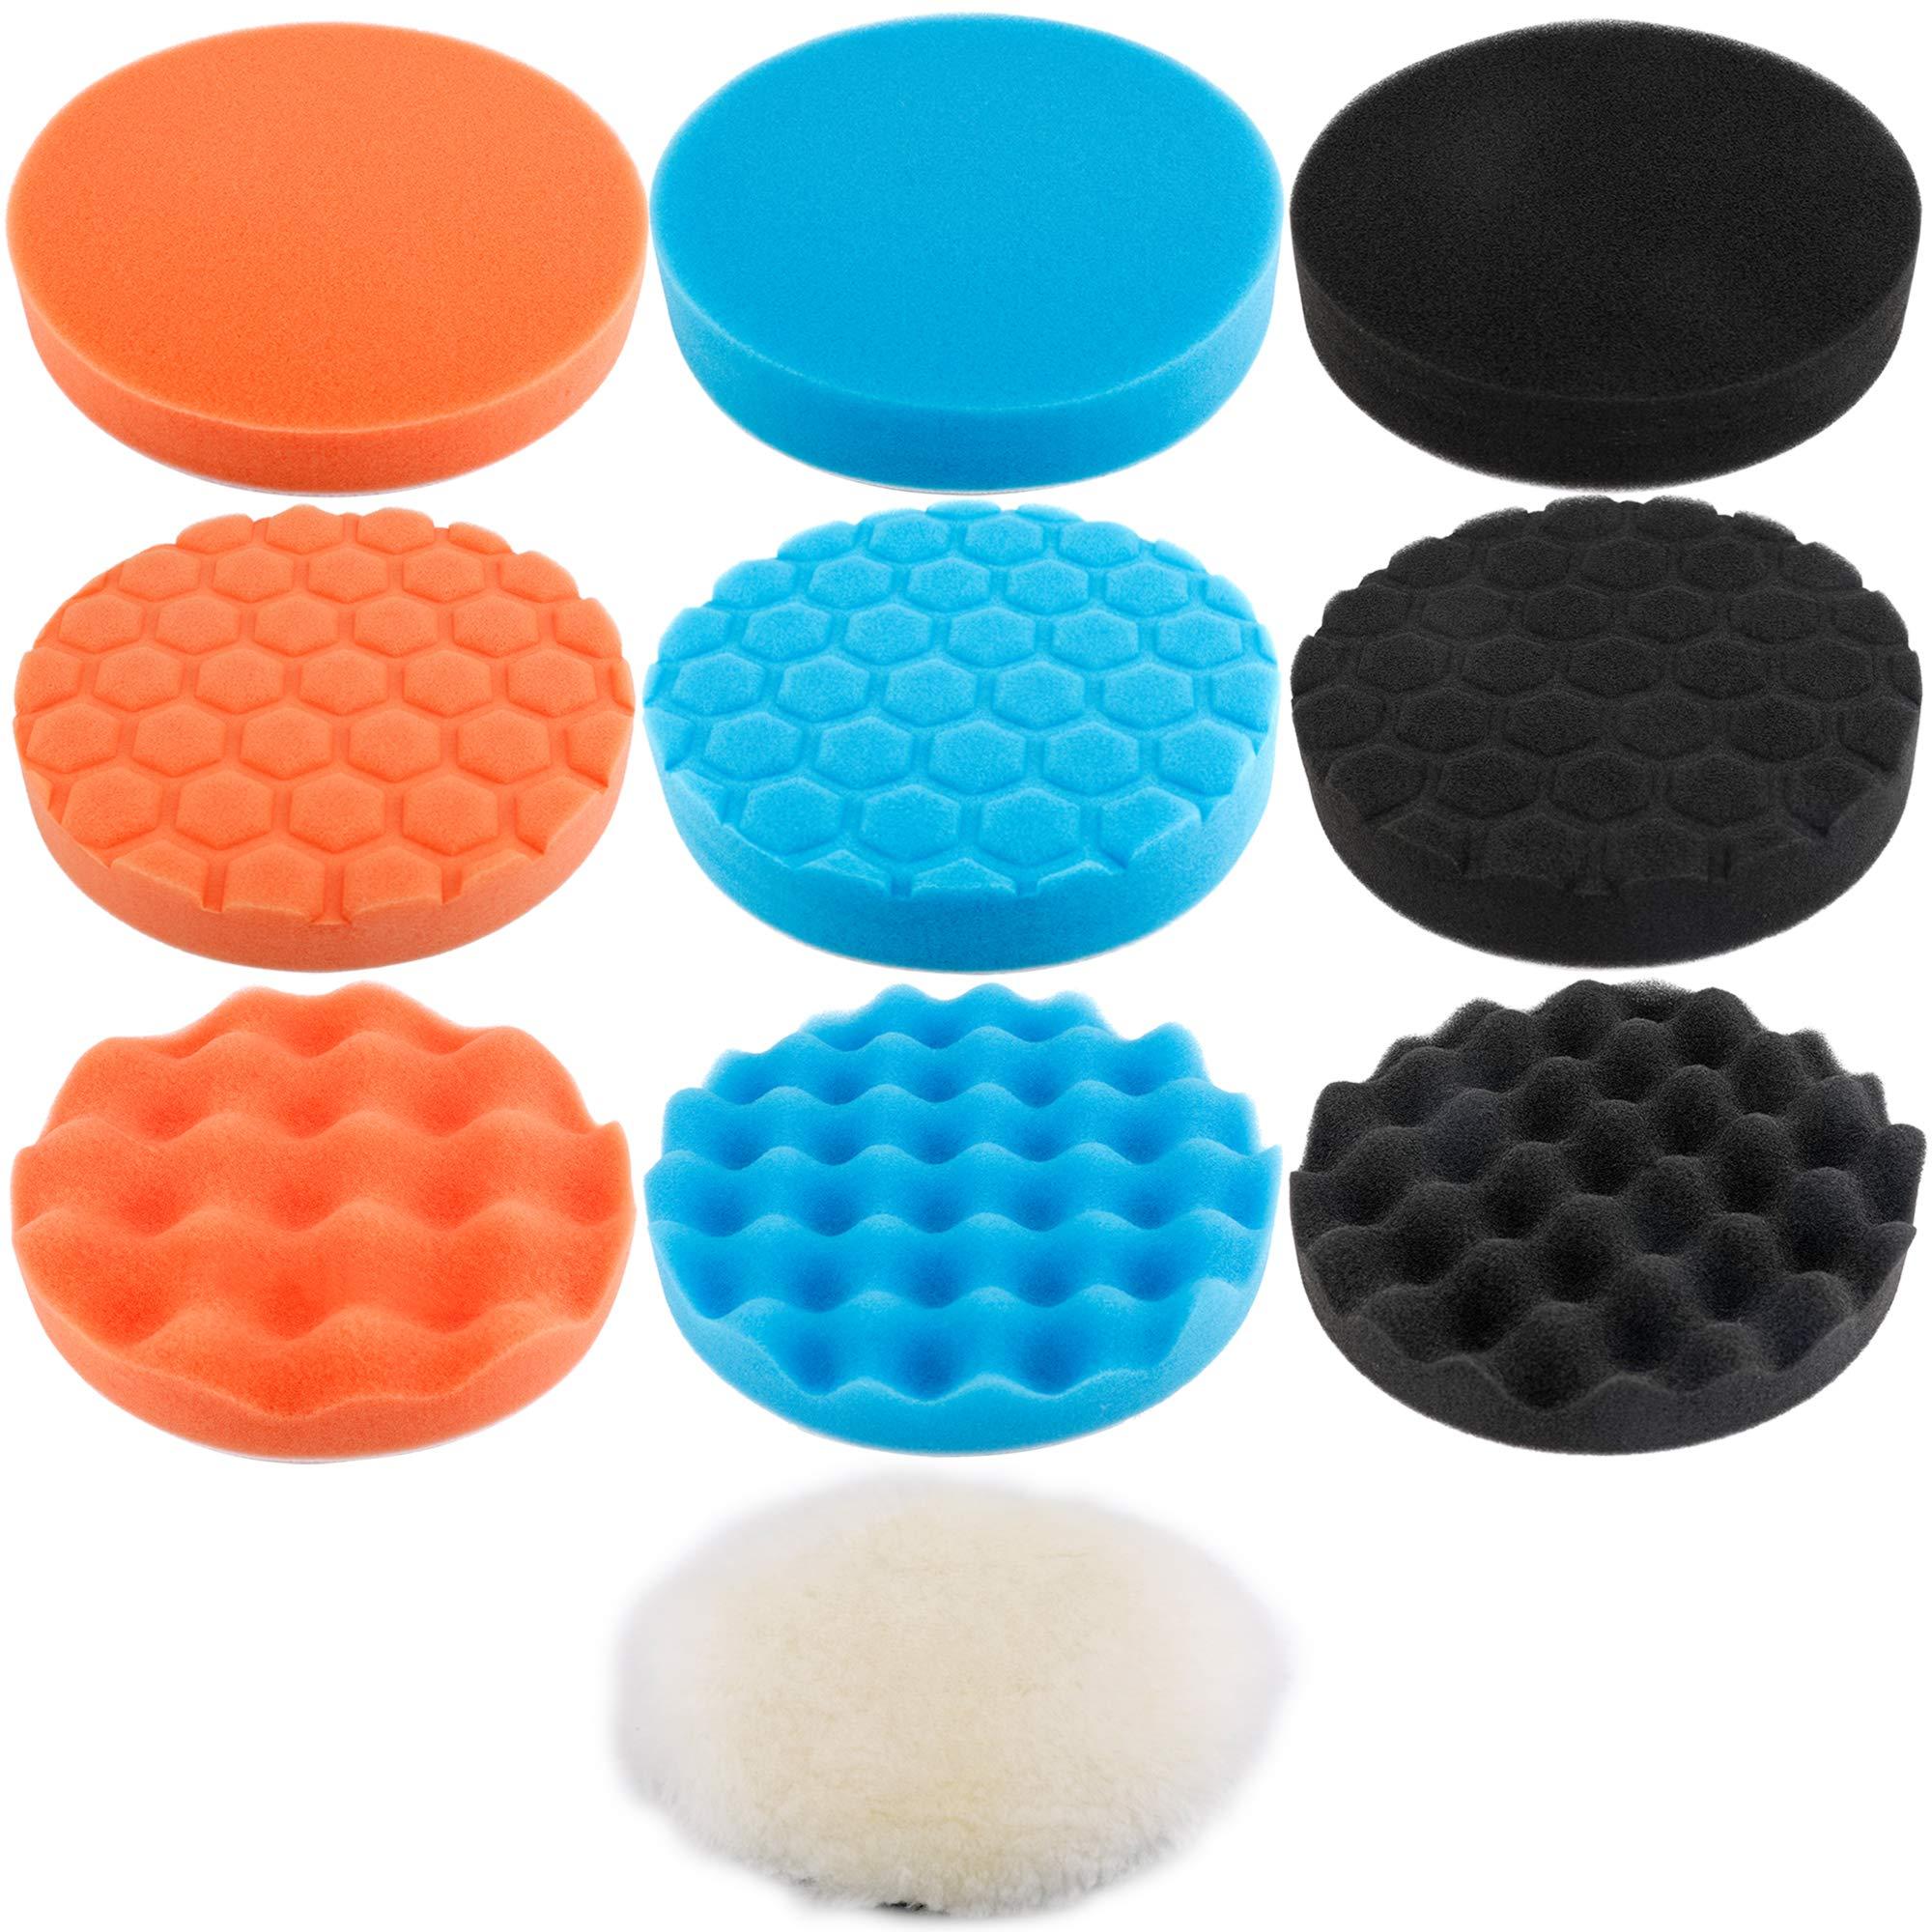 Augshy 10Pcs,6 inch Car Foam Drill Polishing Pad Kit,3 Styles Buffing Pads¡